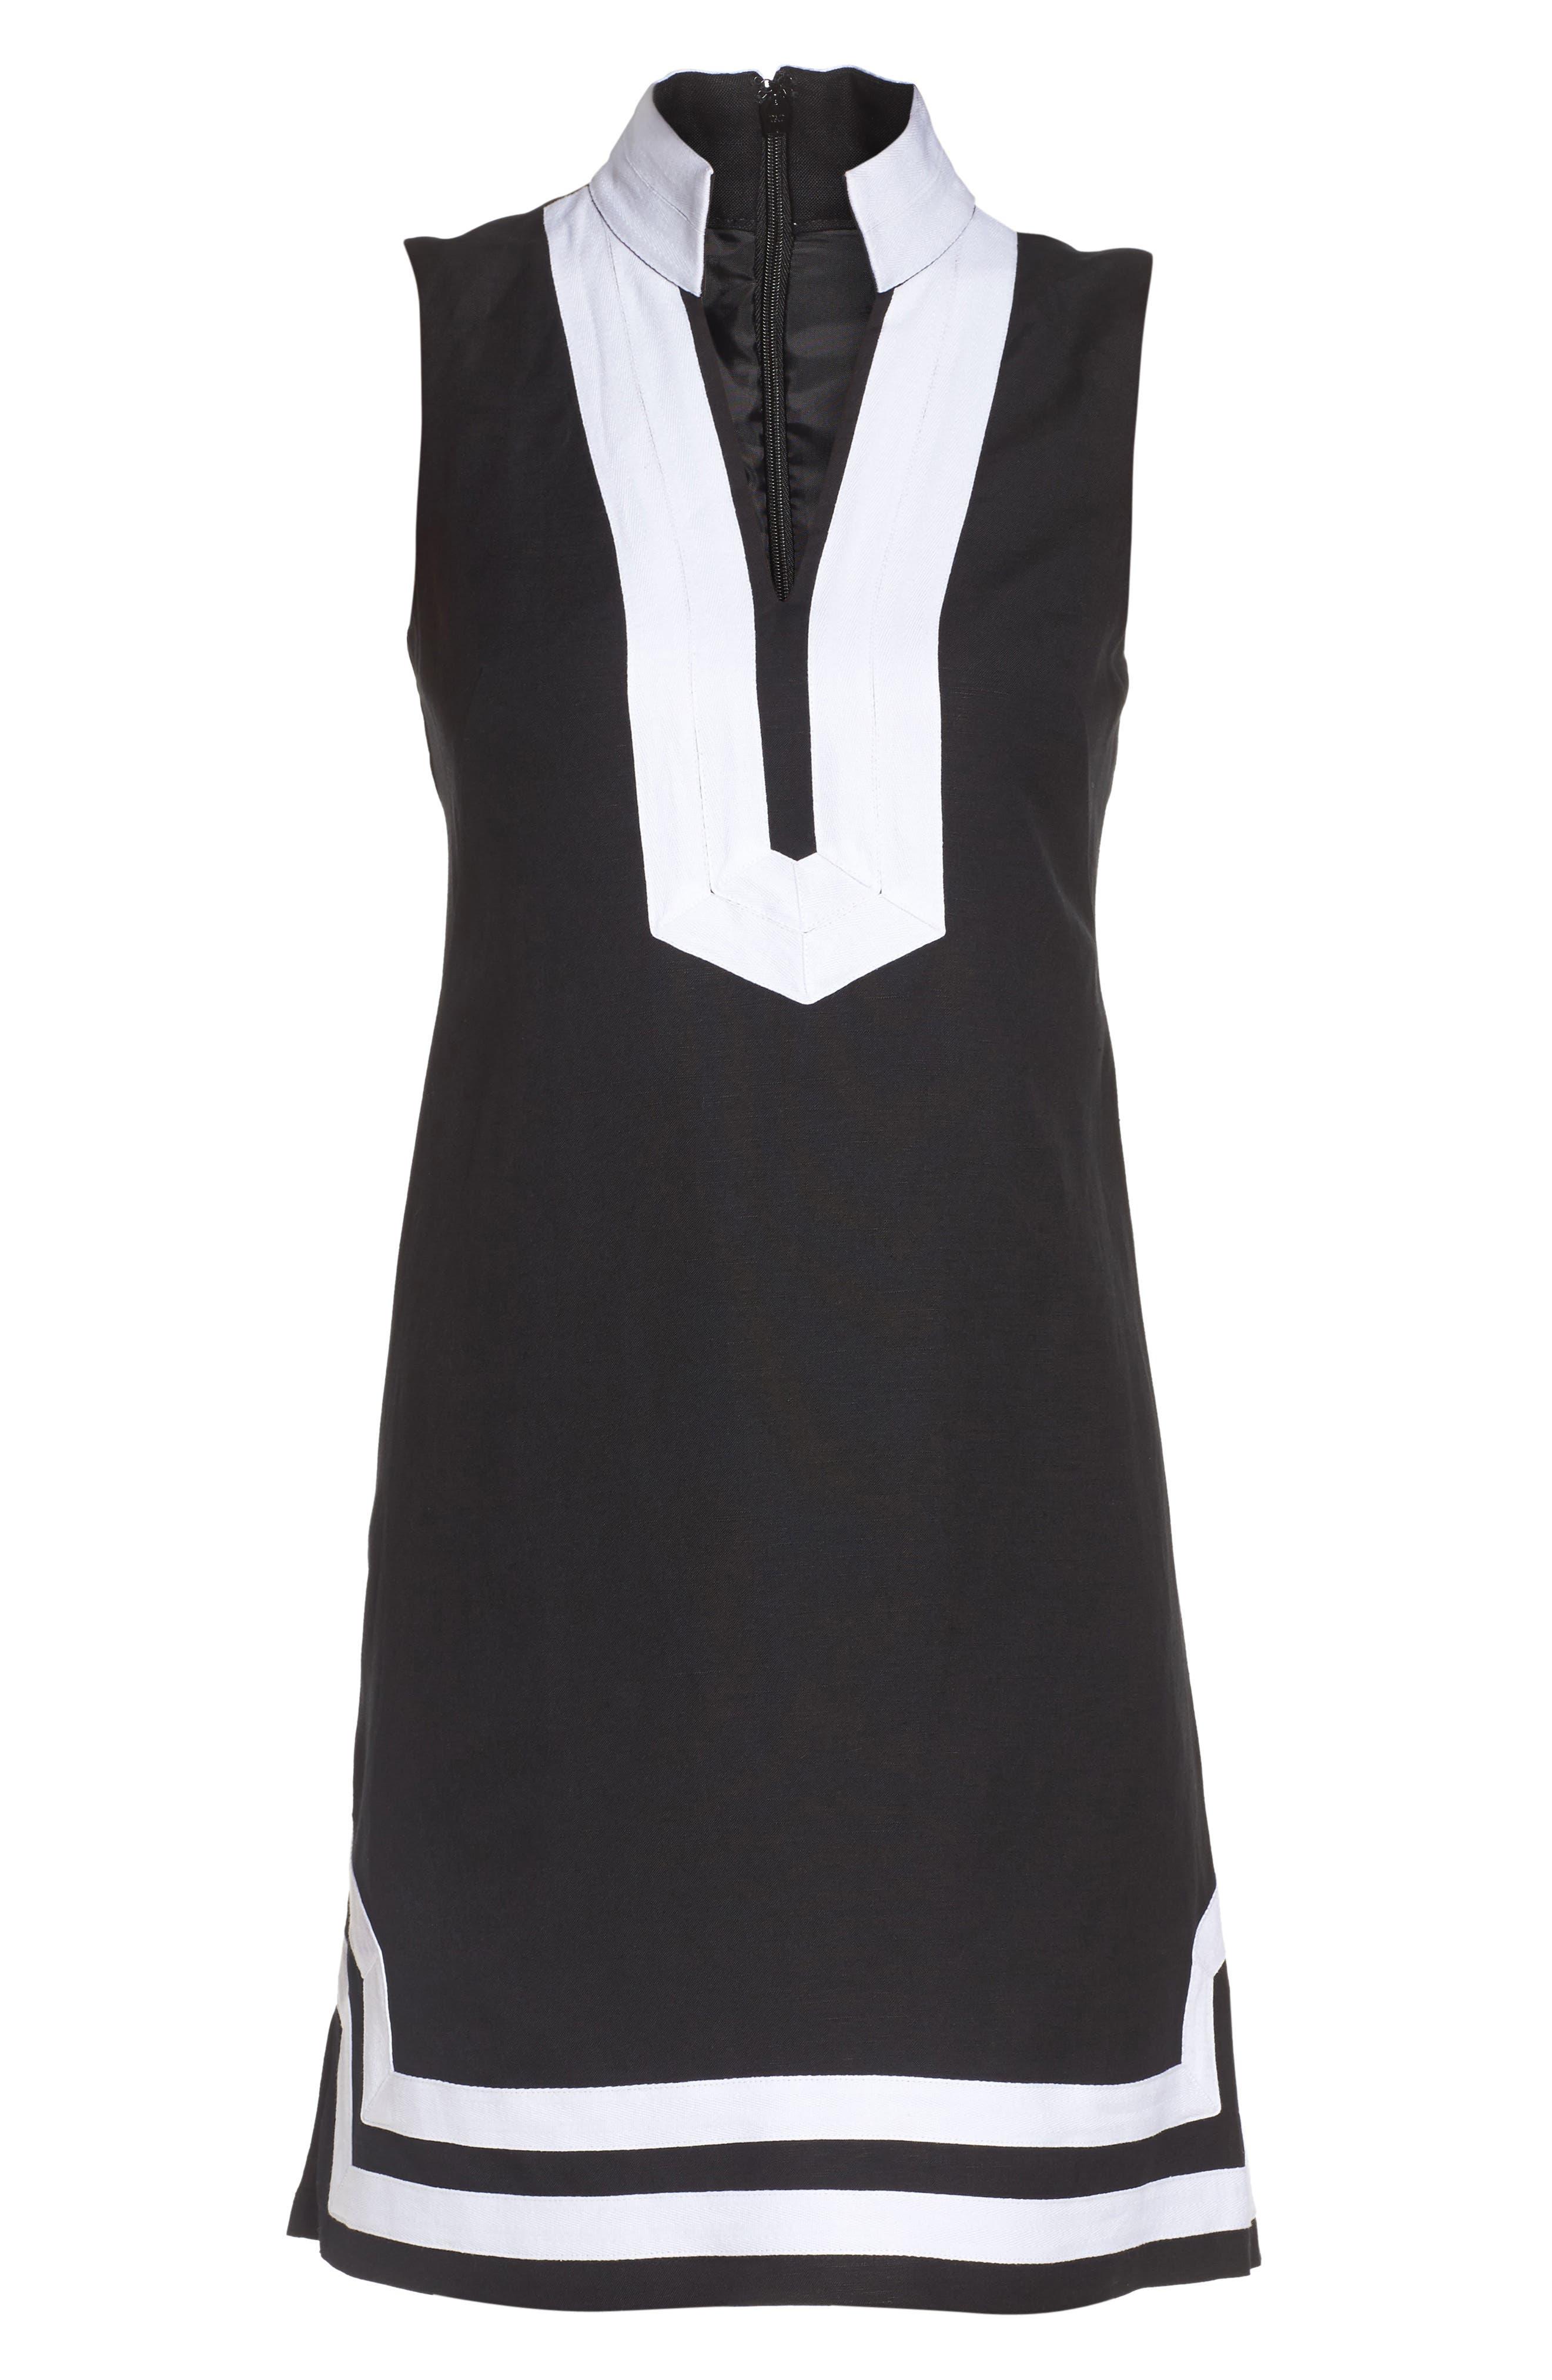 Mandarin Collar Linen Blend Sheath Dress,                             Alternate thumbnail 6, color,                             006